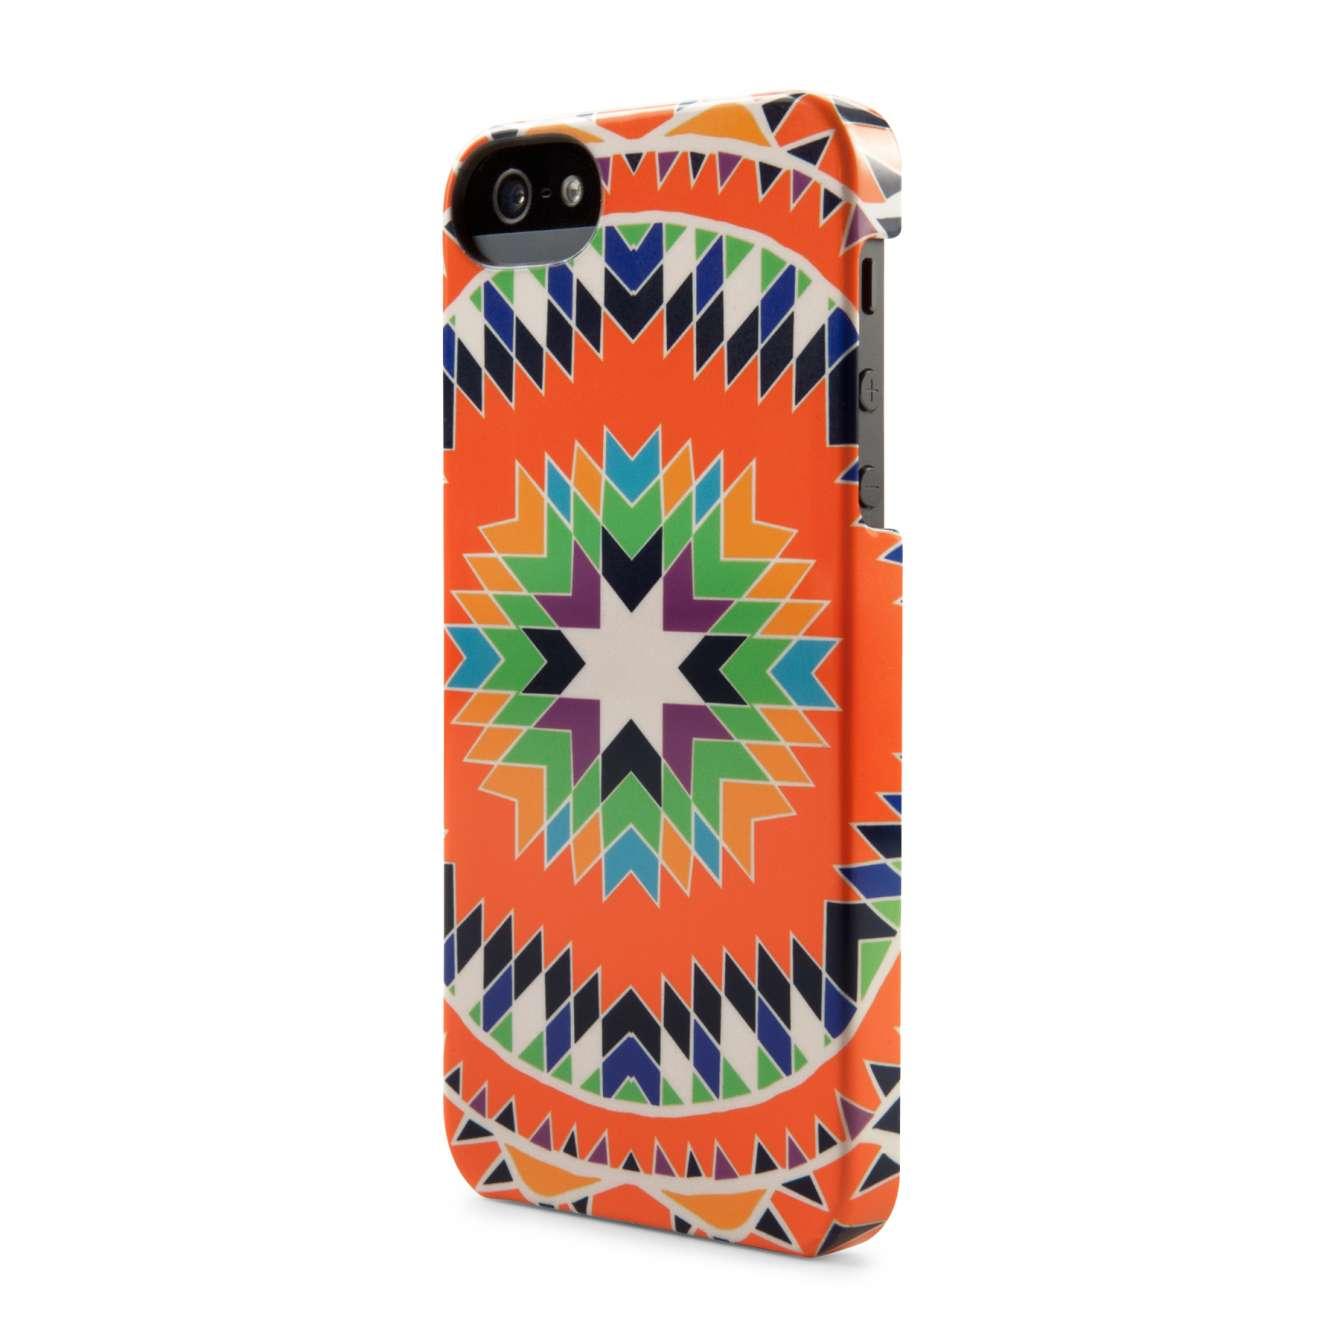 Mara Hoffman x Incase iPhone 5 Snap Cases-3